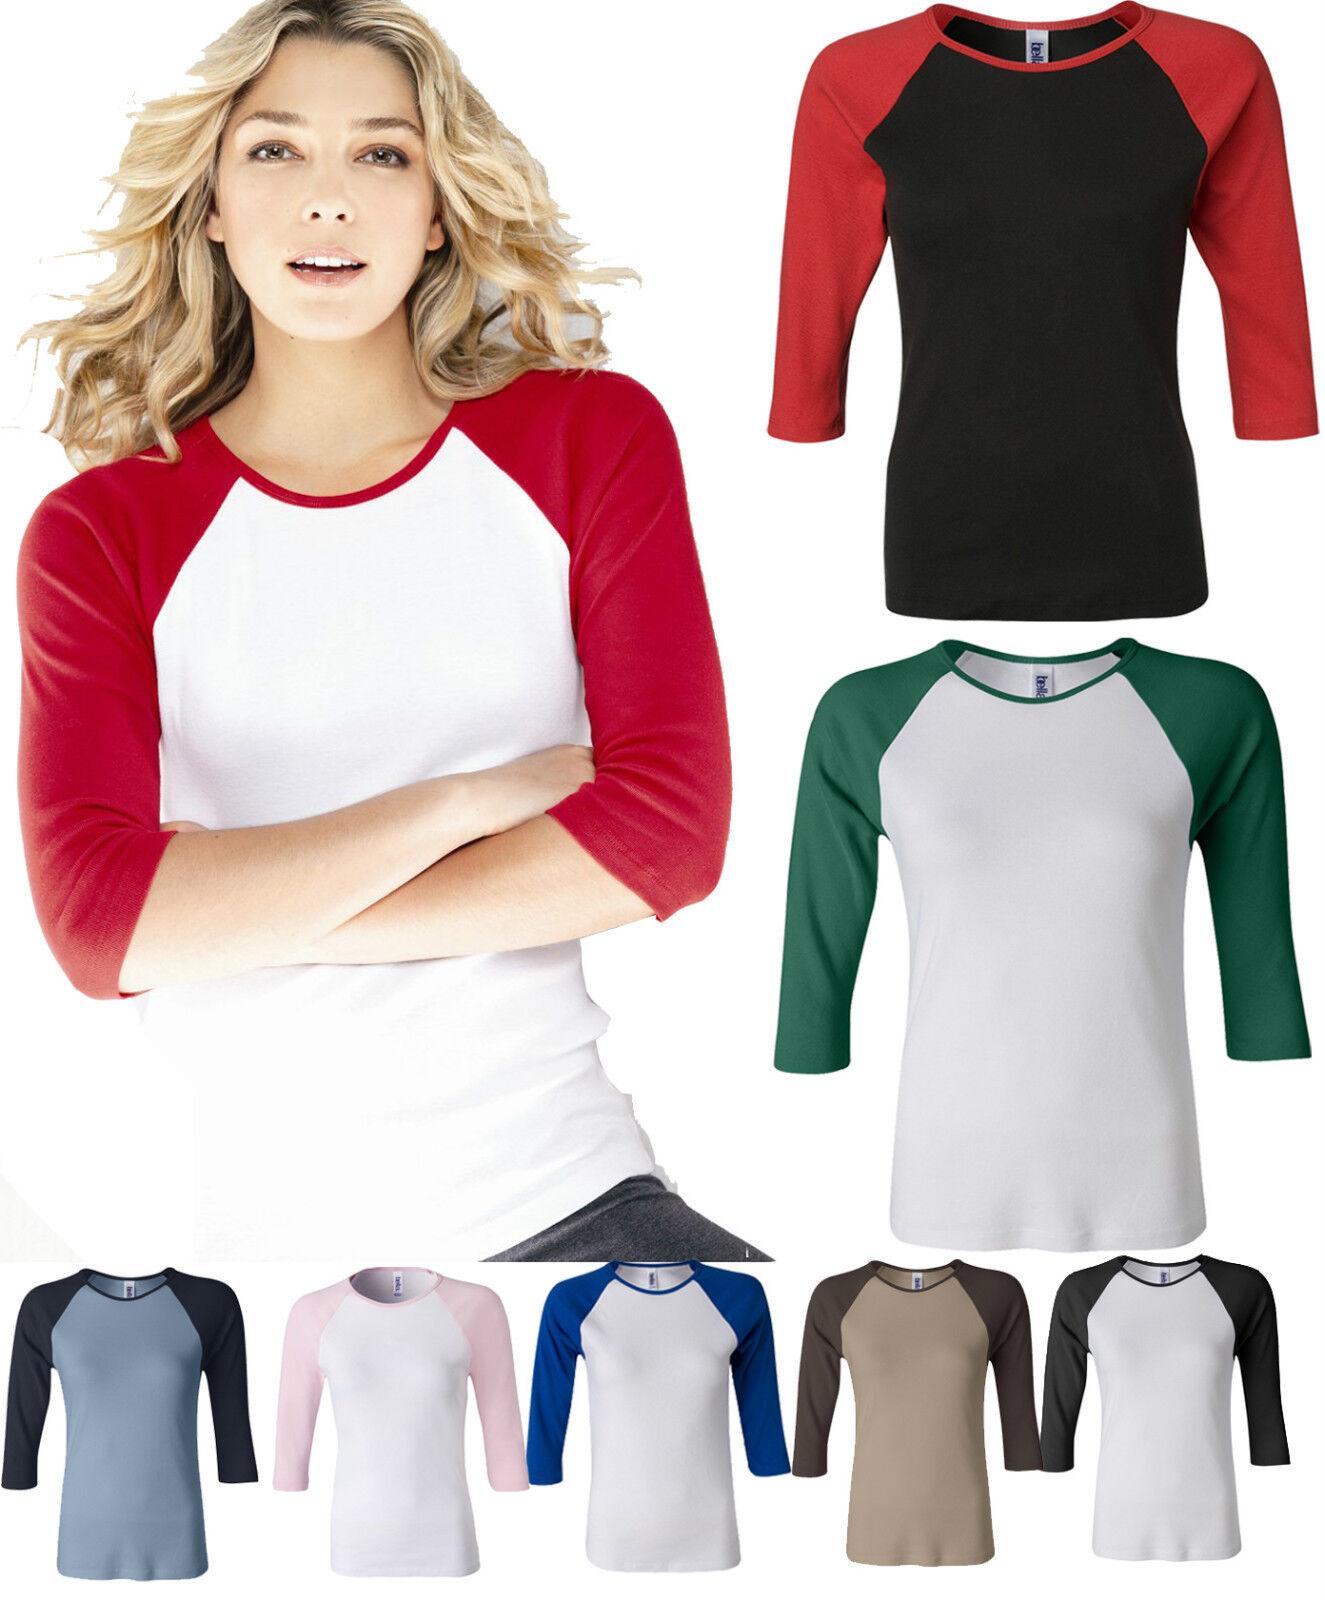 Bella ladies new size s 2xl baseball raglan 3 4 sleeve t for 3 4 sleeve t shirts plus size